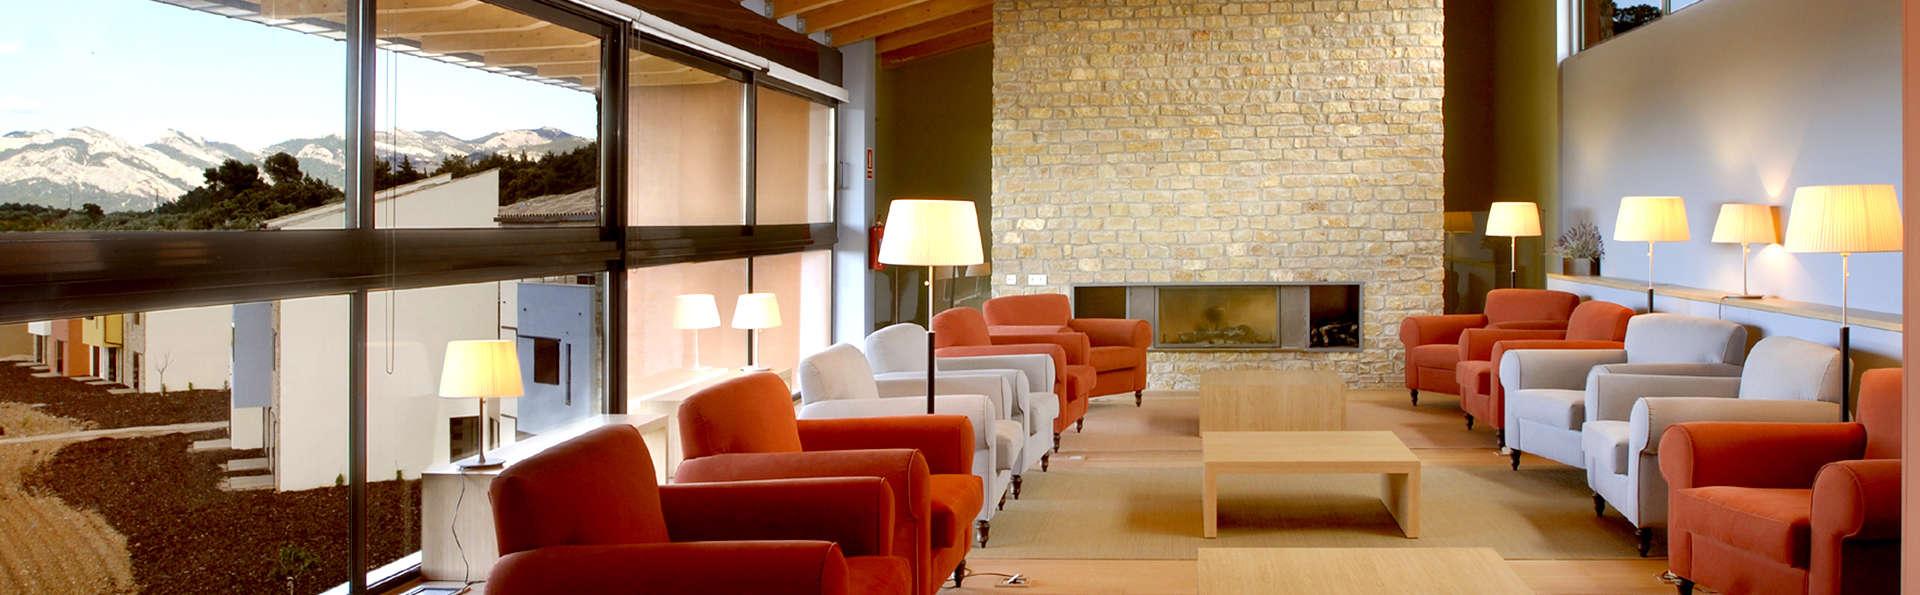 Hotel Vilar Rural de Arnes - Edit_Lounge.jpg